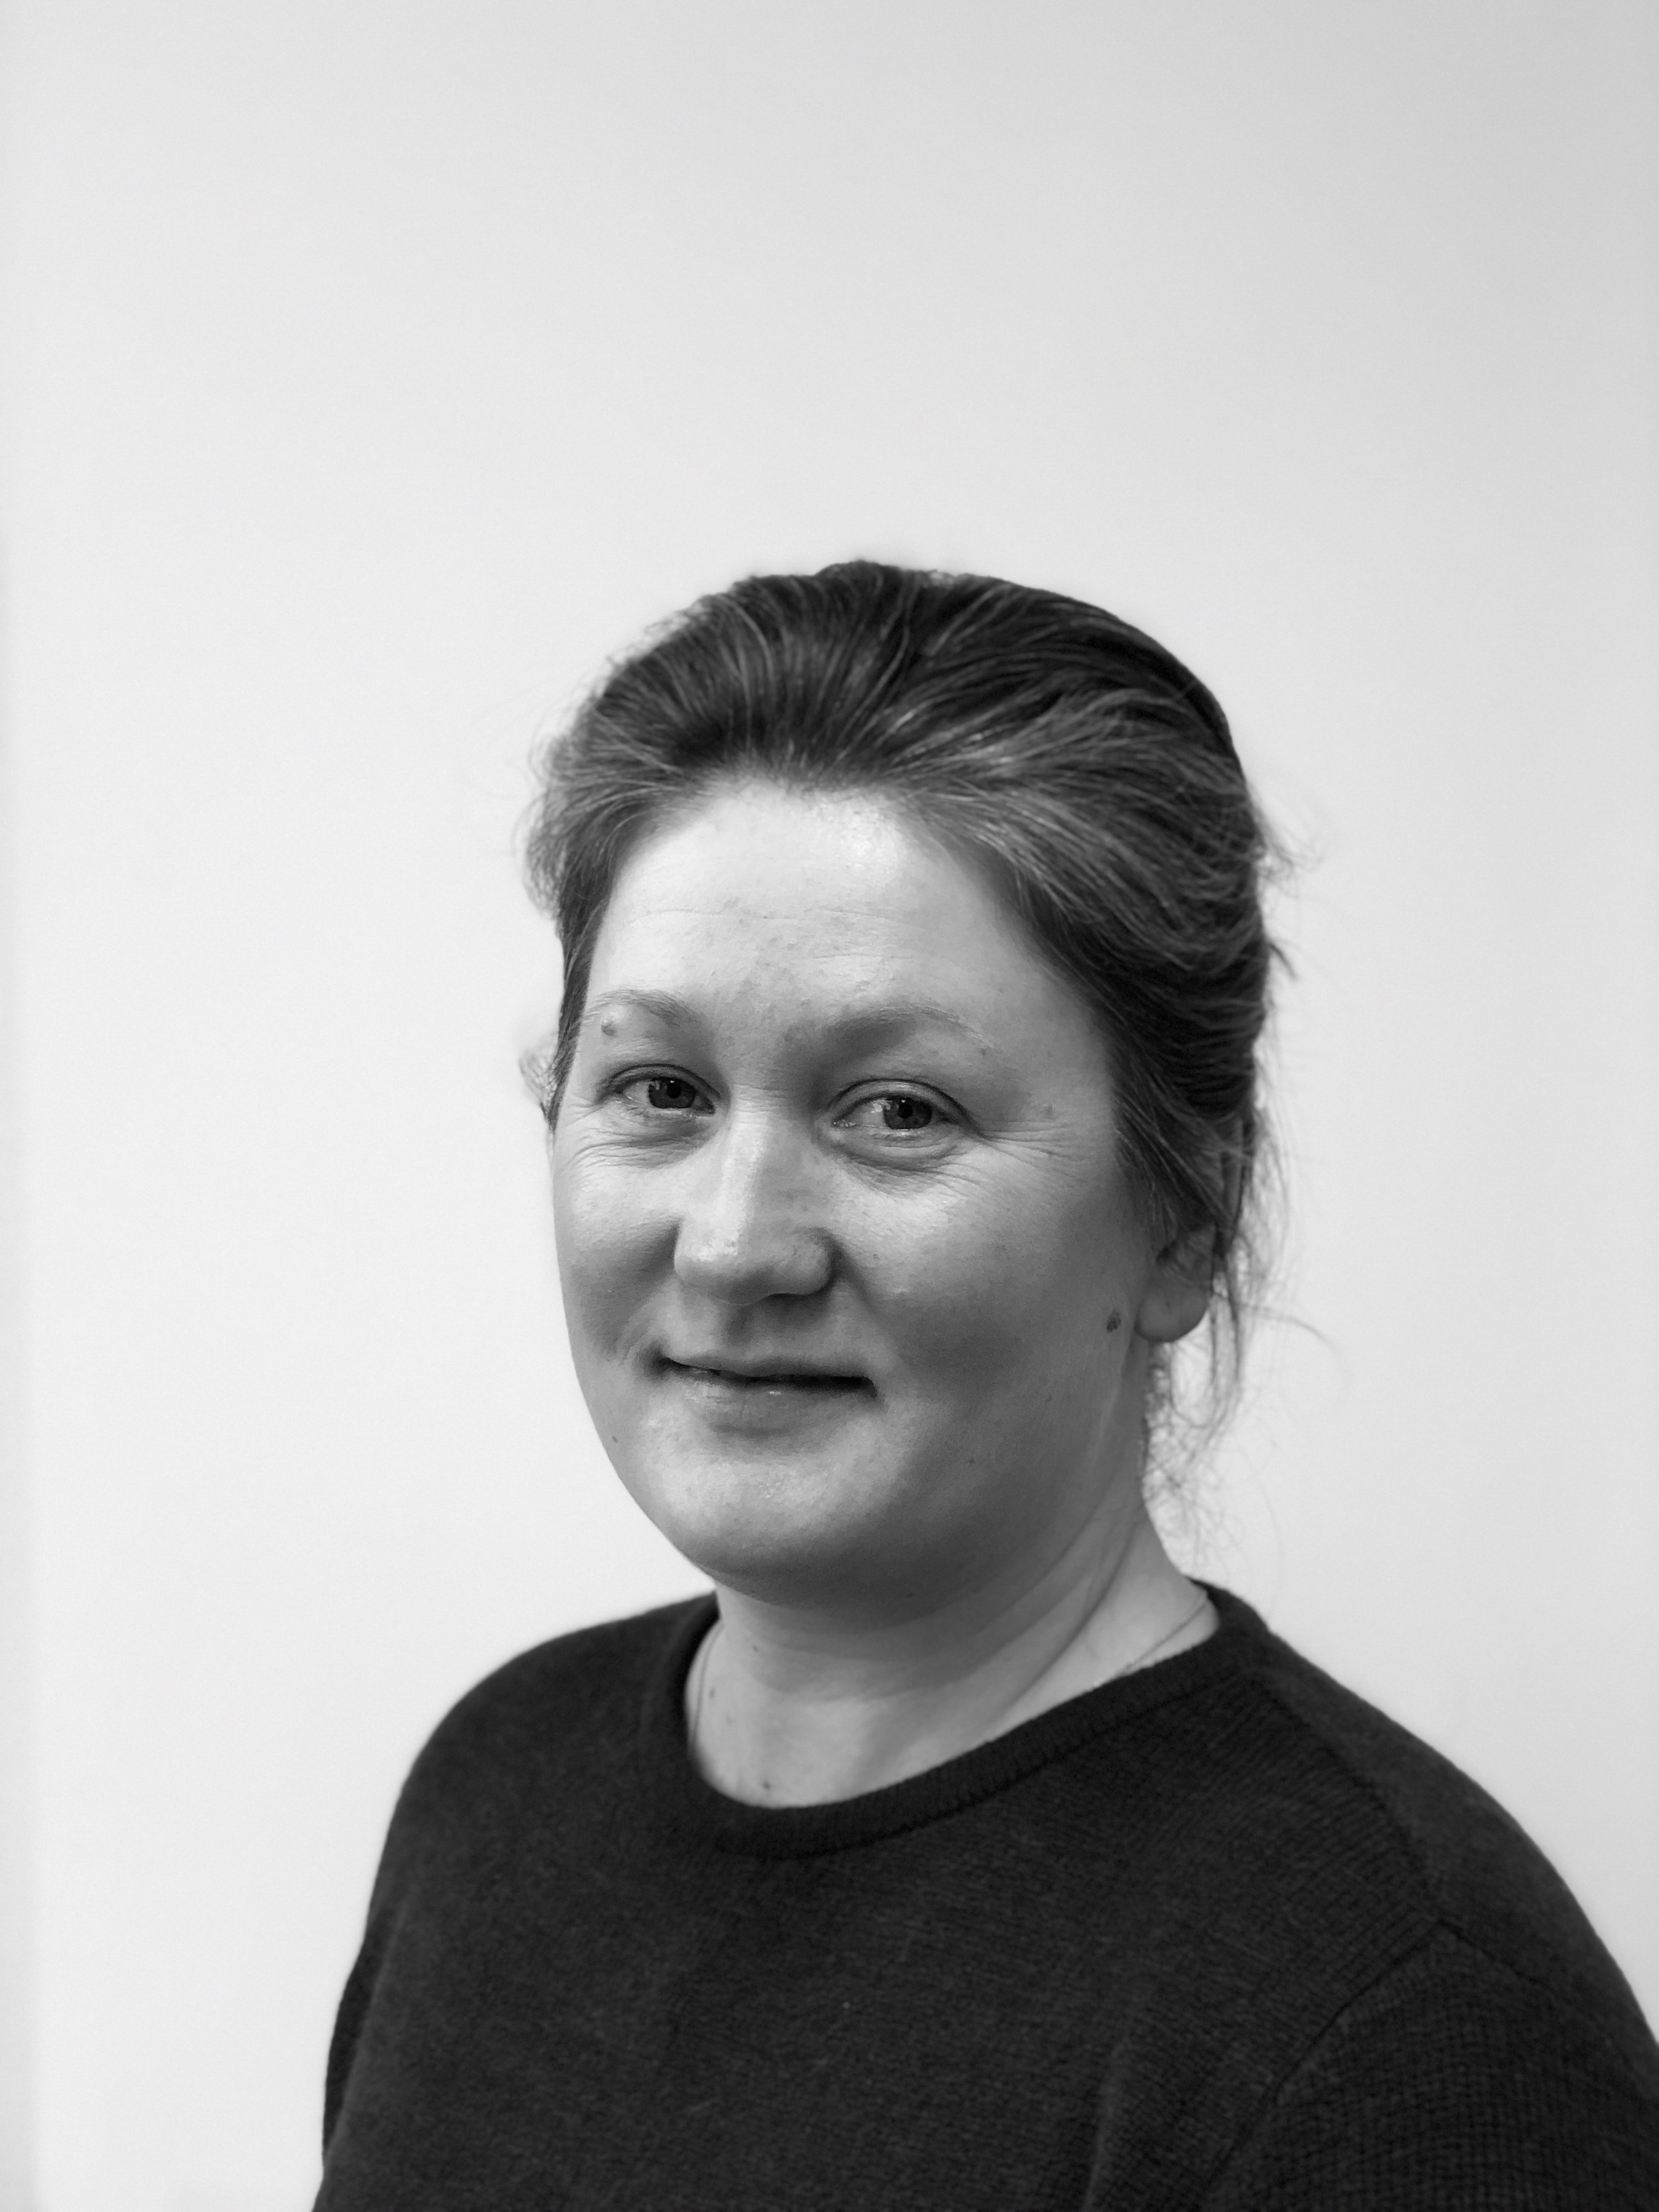 Susanne Whittles Sjølie